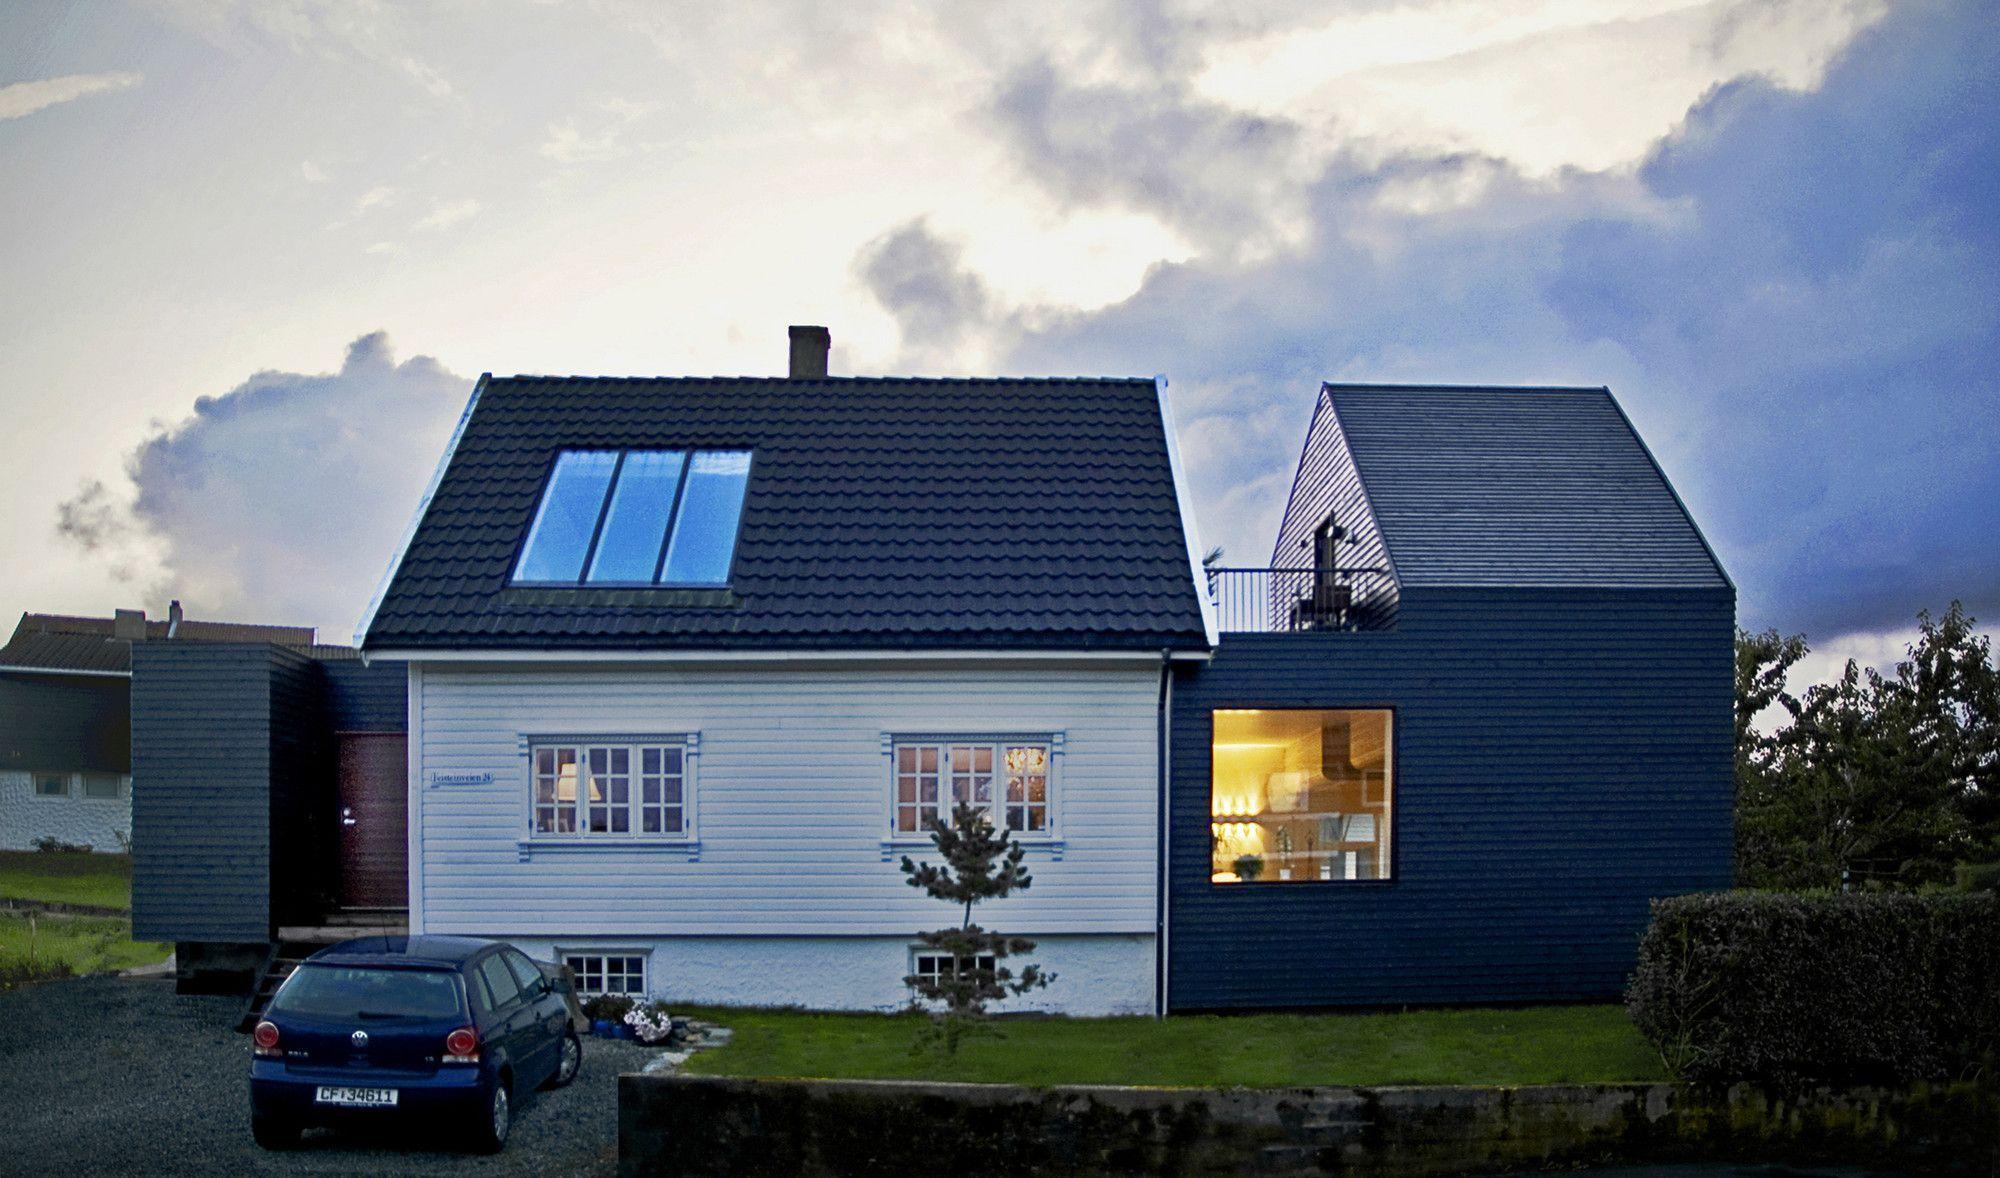 Gallery of Feisteinveien / Rever & Drage Architects – 3 Feisteinveien,© Tom Auger – Anbau